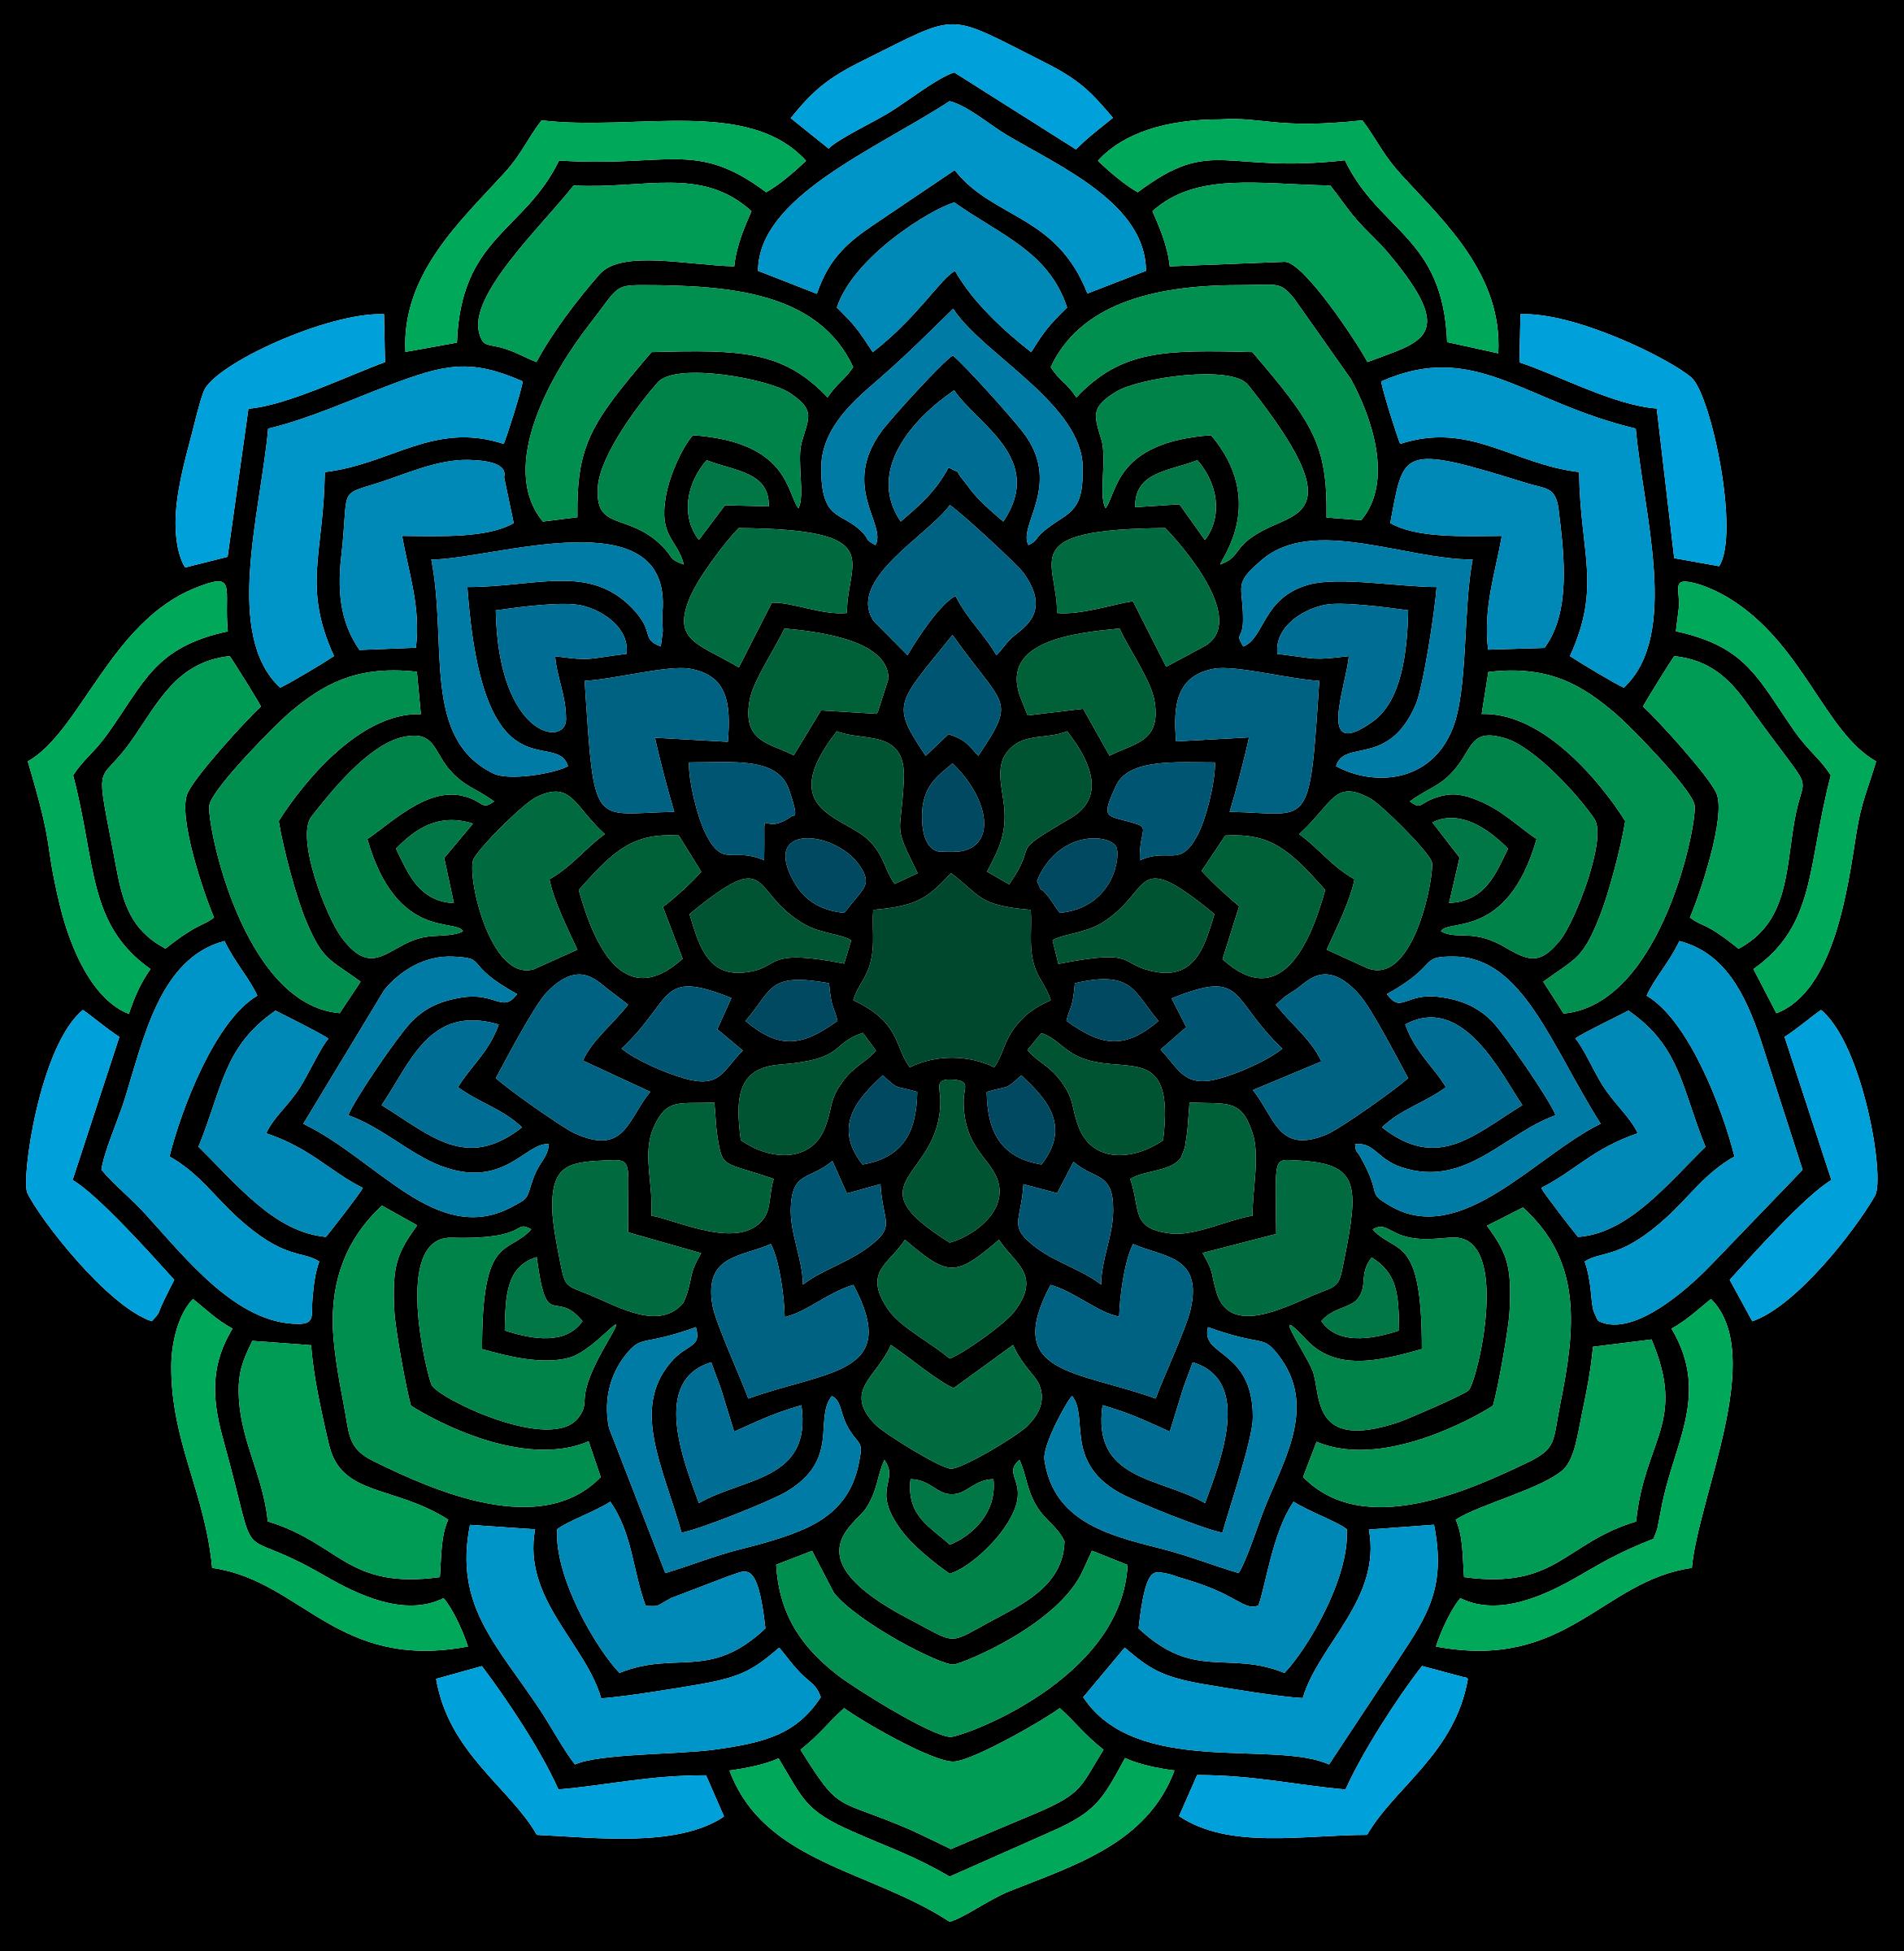 Mandala vector clipart clipart freeuse library Green and Blue Mandala vector clipart image - Free stock photo ... clipart freeuse library